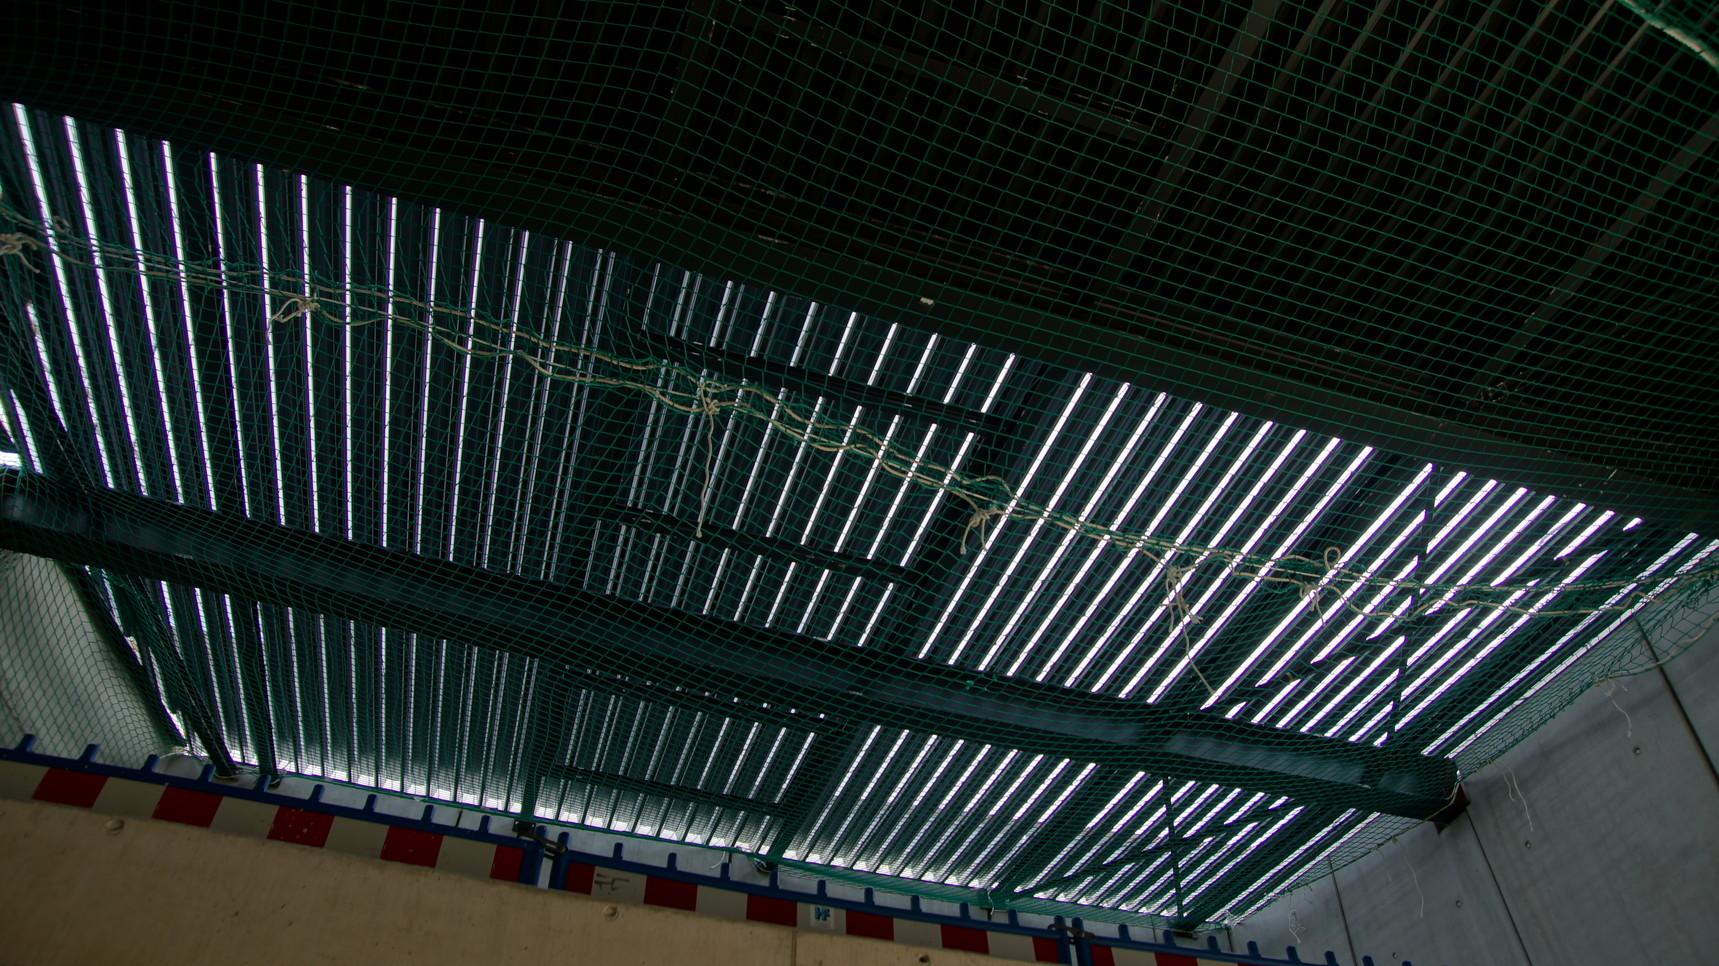 Dach vom Saal